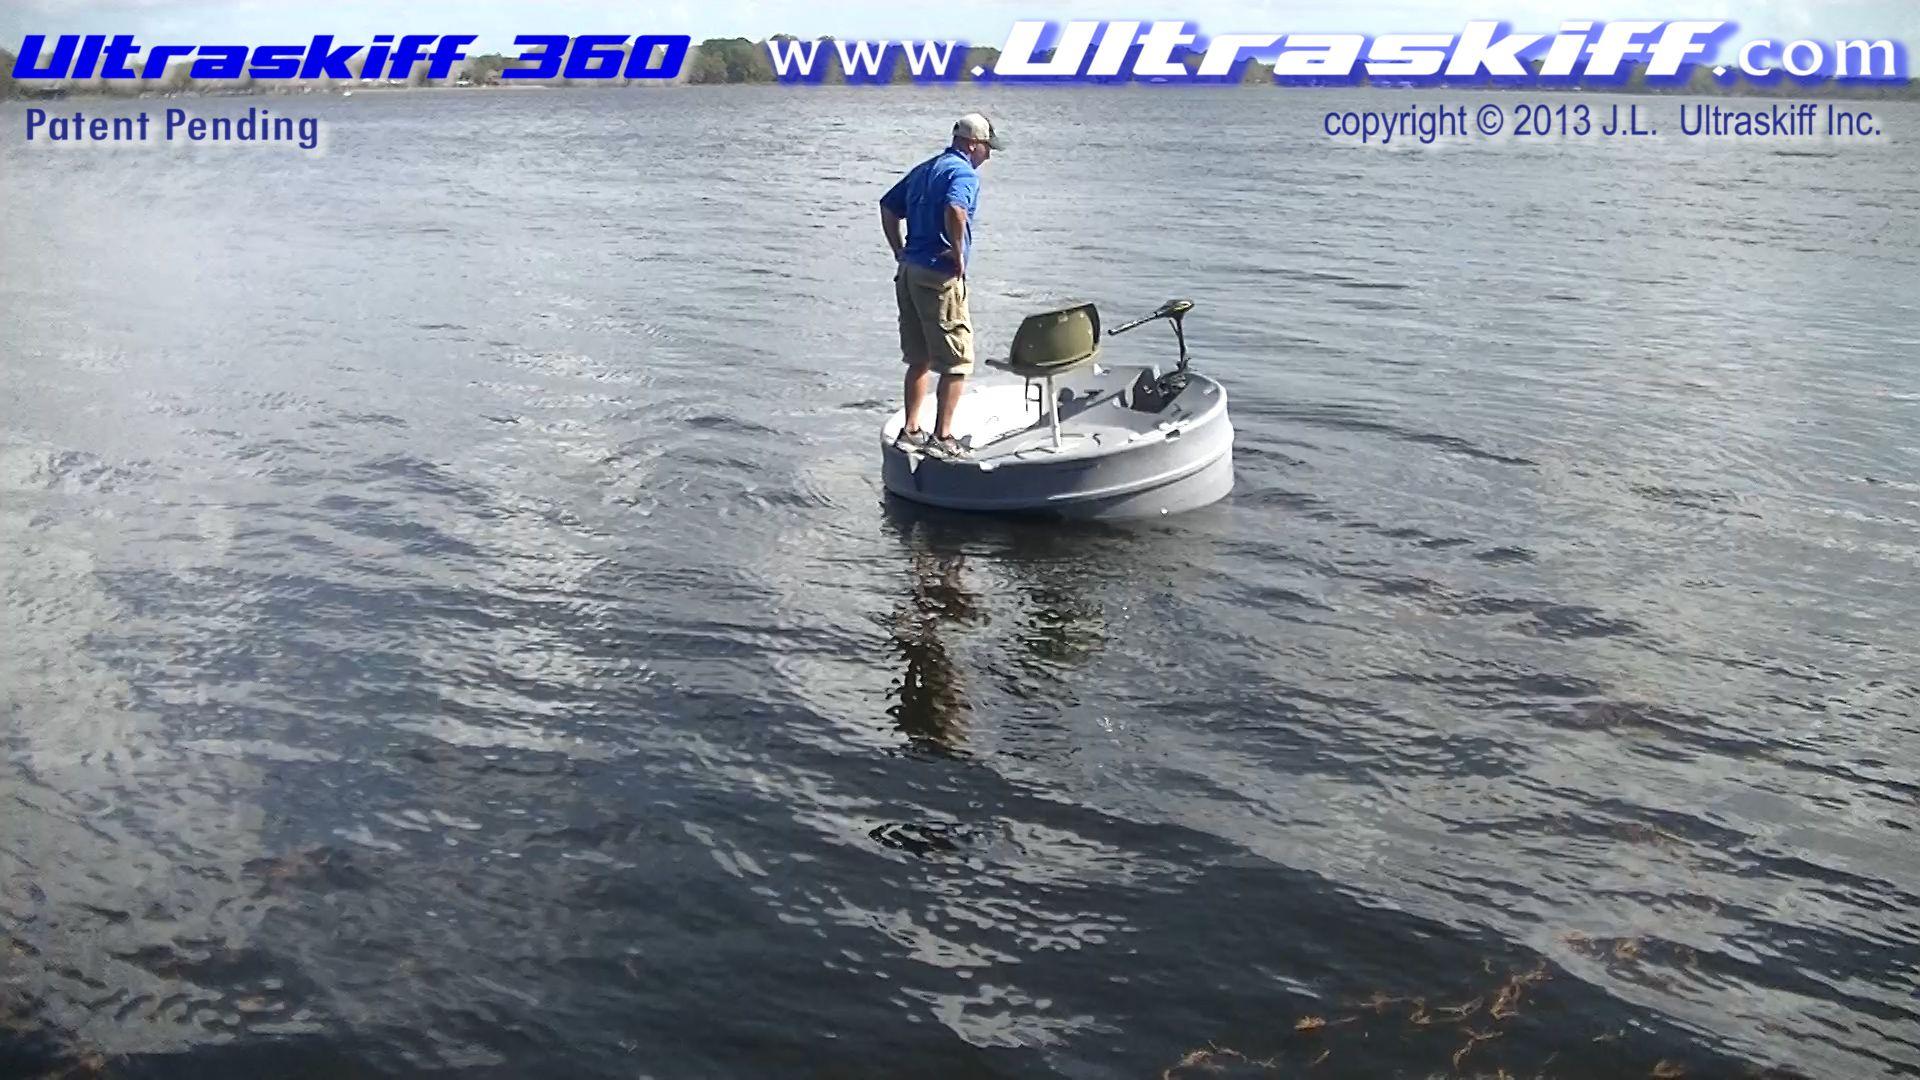 Ultraskiff | Demonstration | Videos | Round Boat | Round